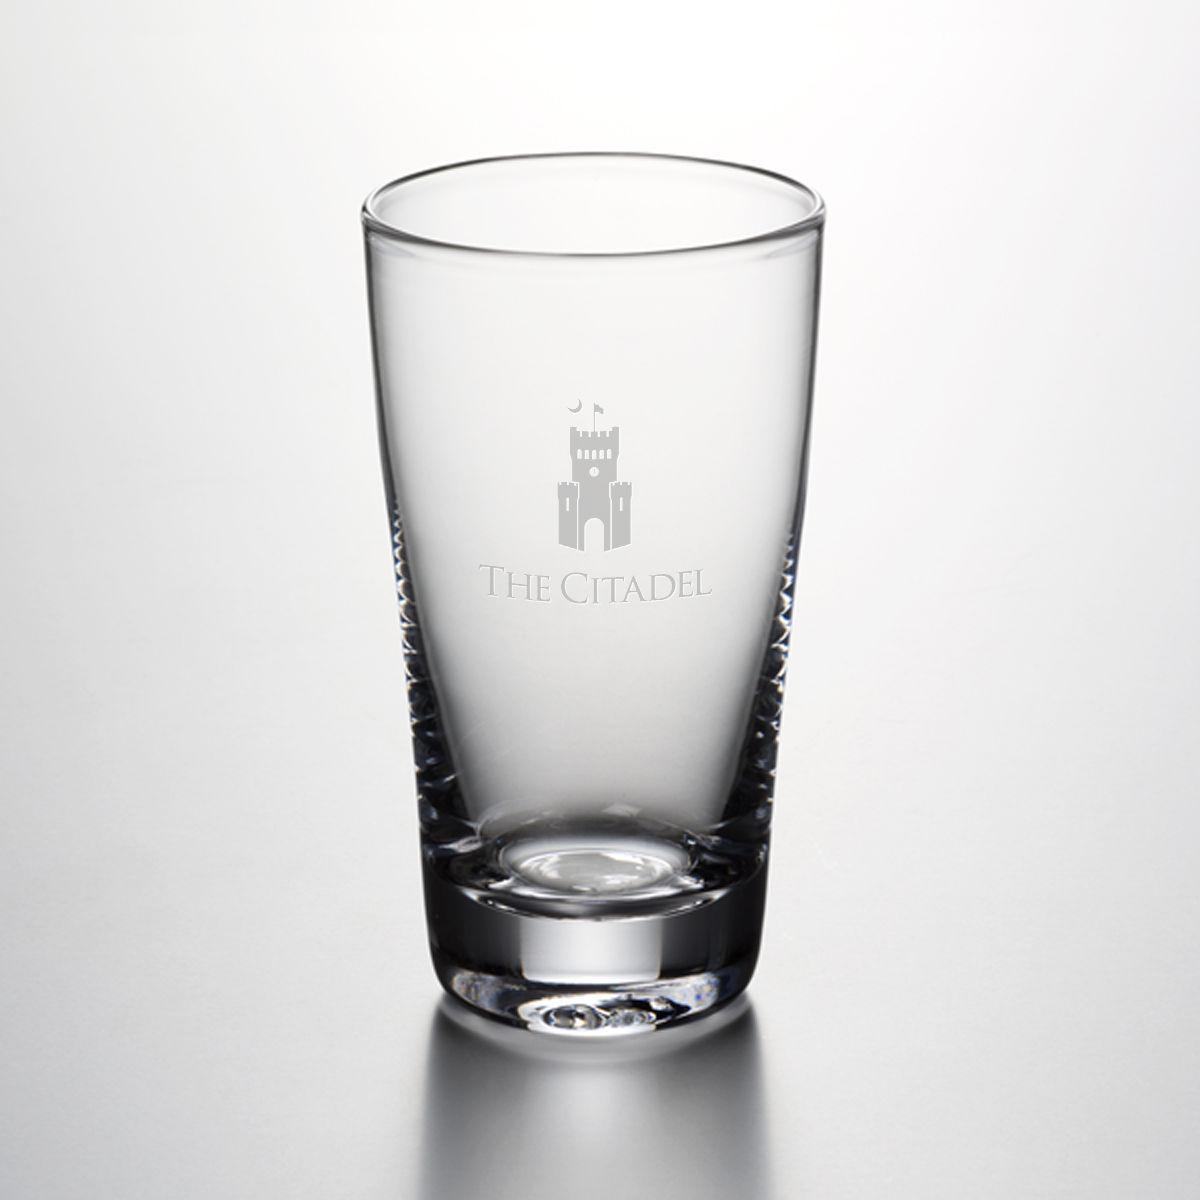 Citadel Pint Glass by Simon Pearce